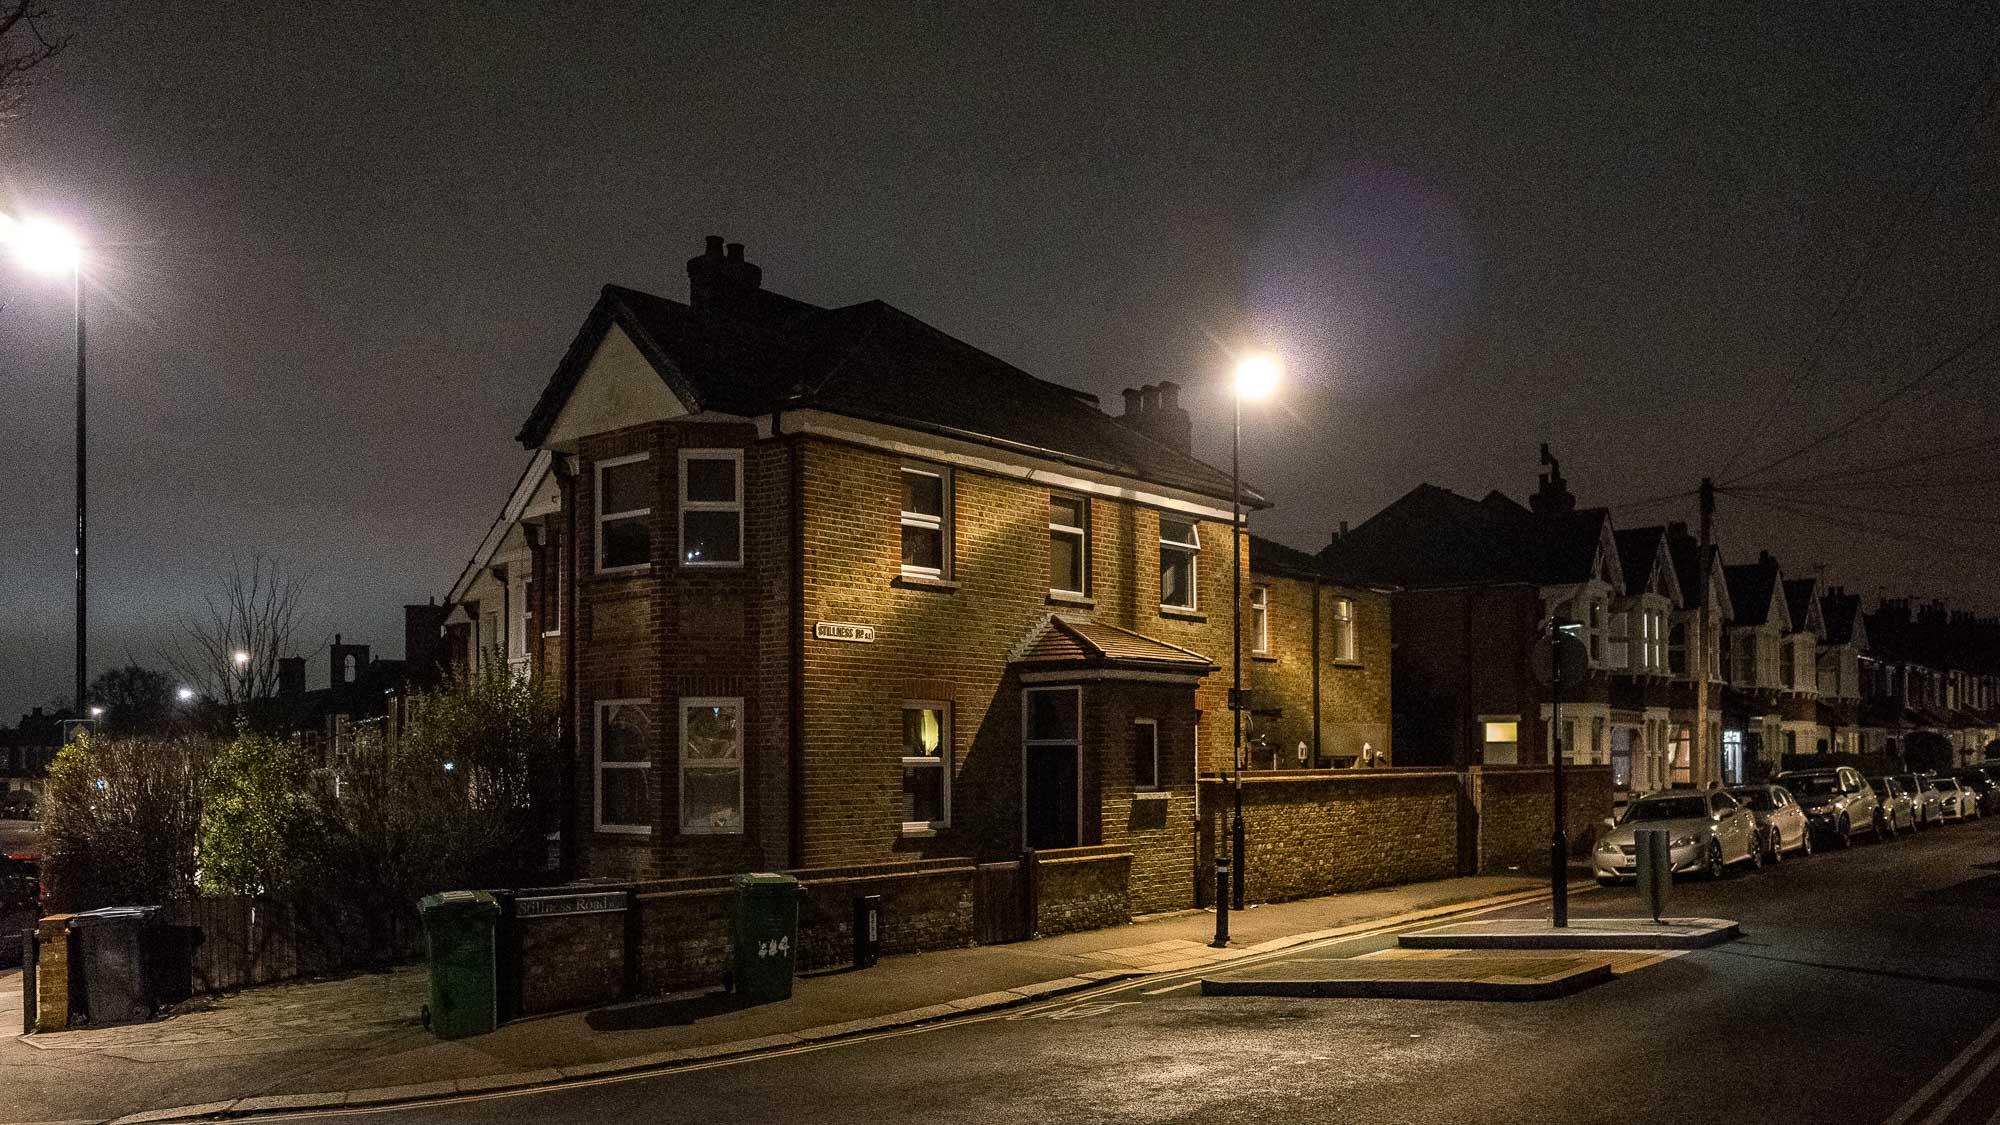 ollo / Strassenecke bei Nacht in London SE